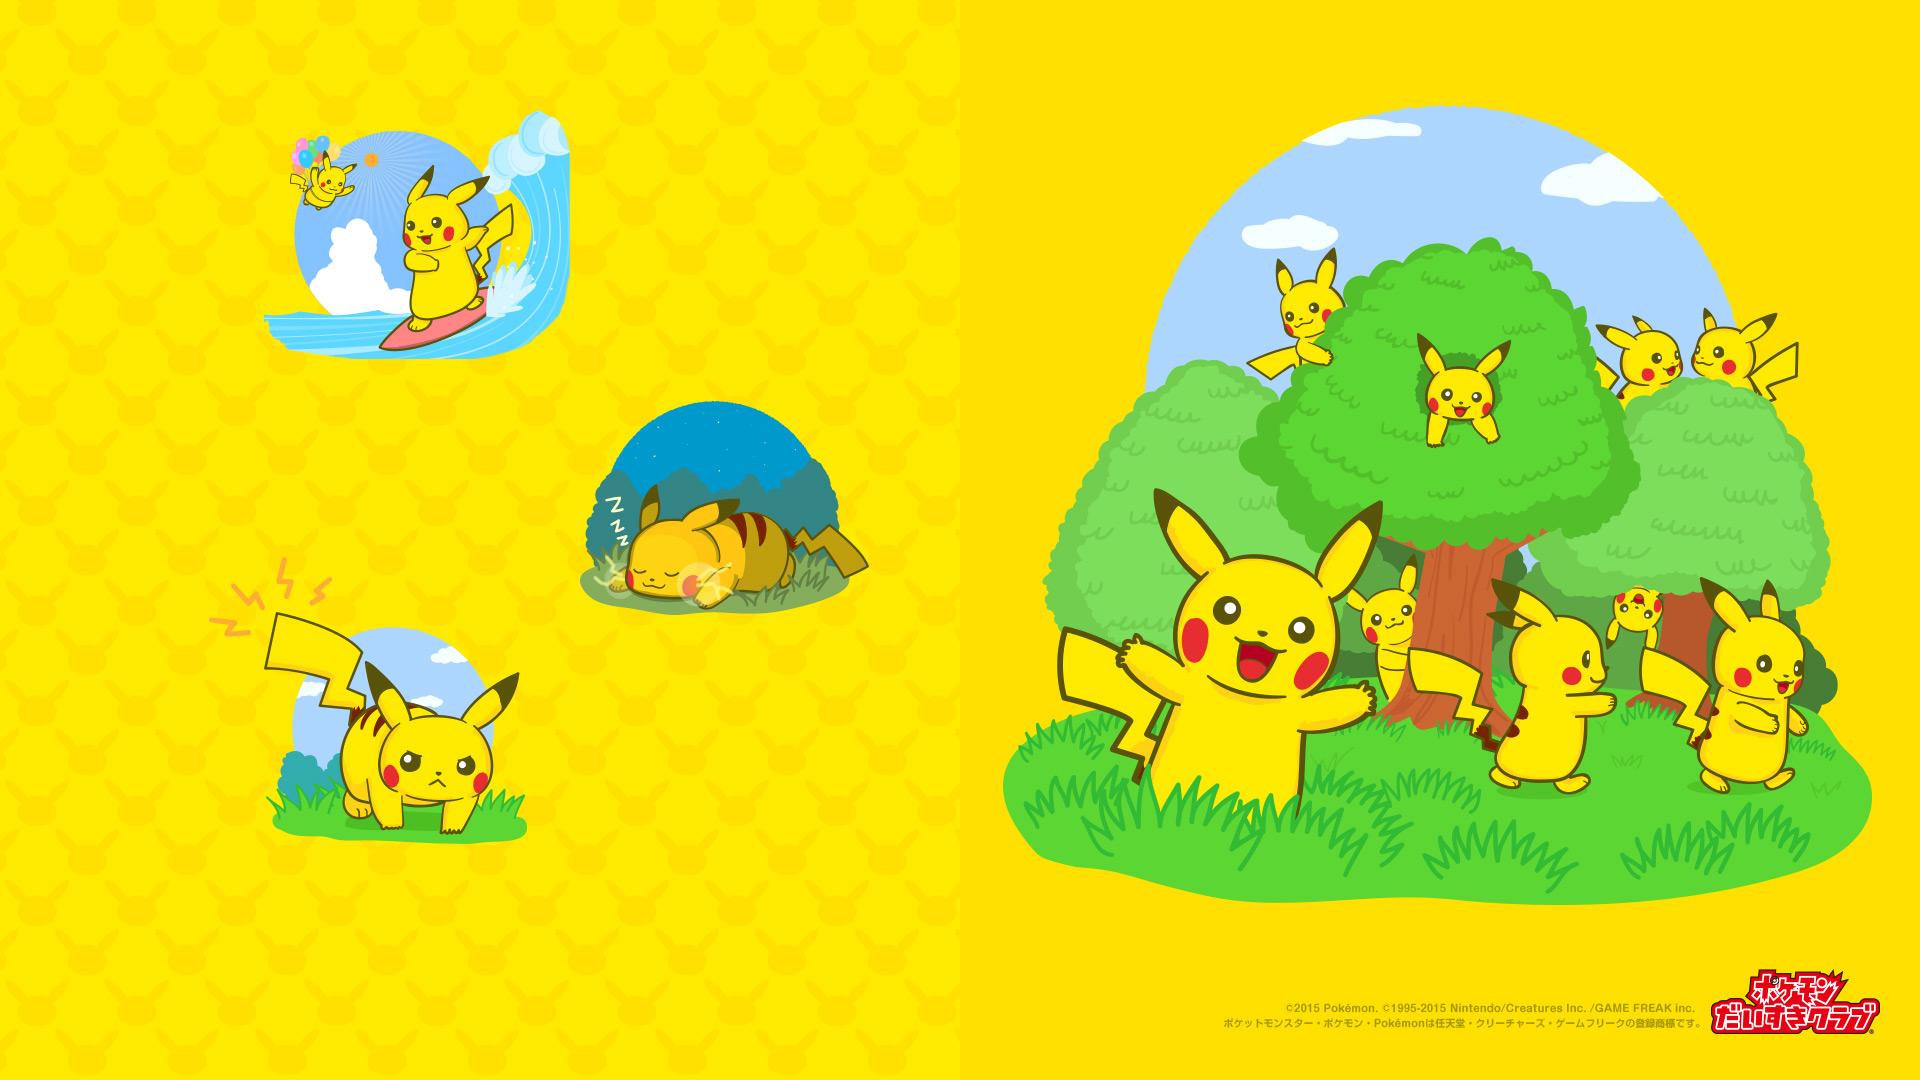 pc_pikachu_wp1920x1080.jpg